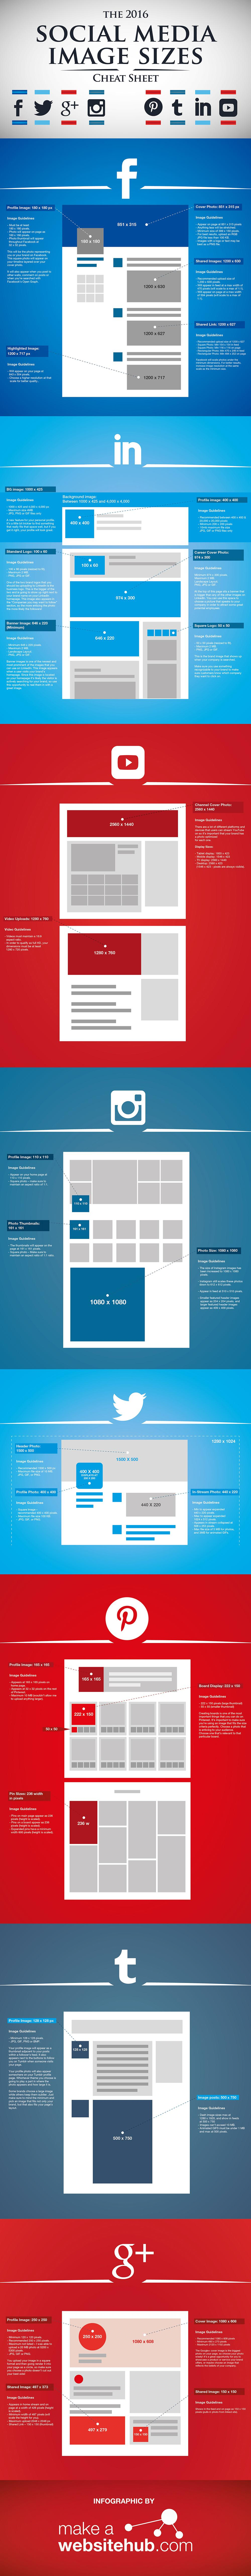 Social Media, Cheat Sheet, Image Sizes